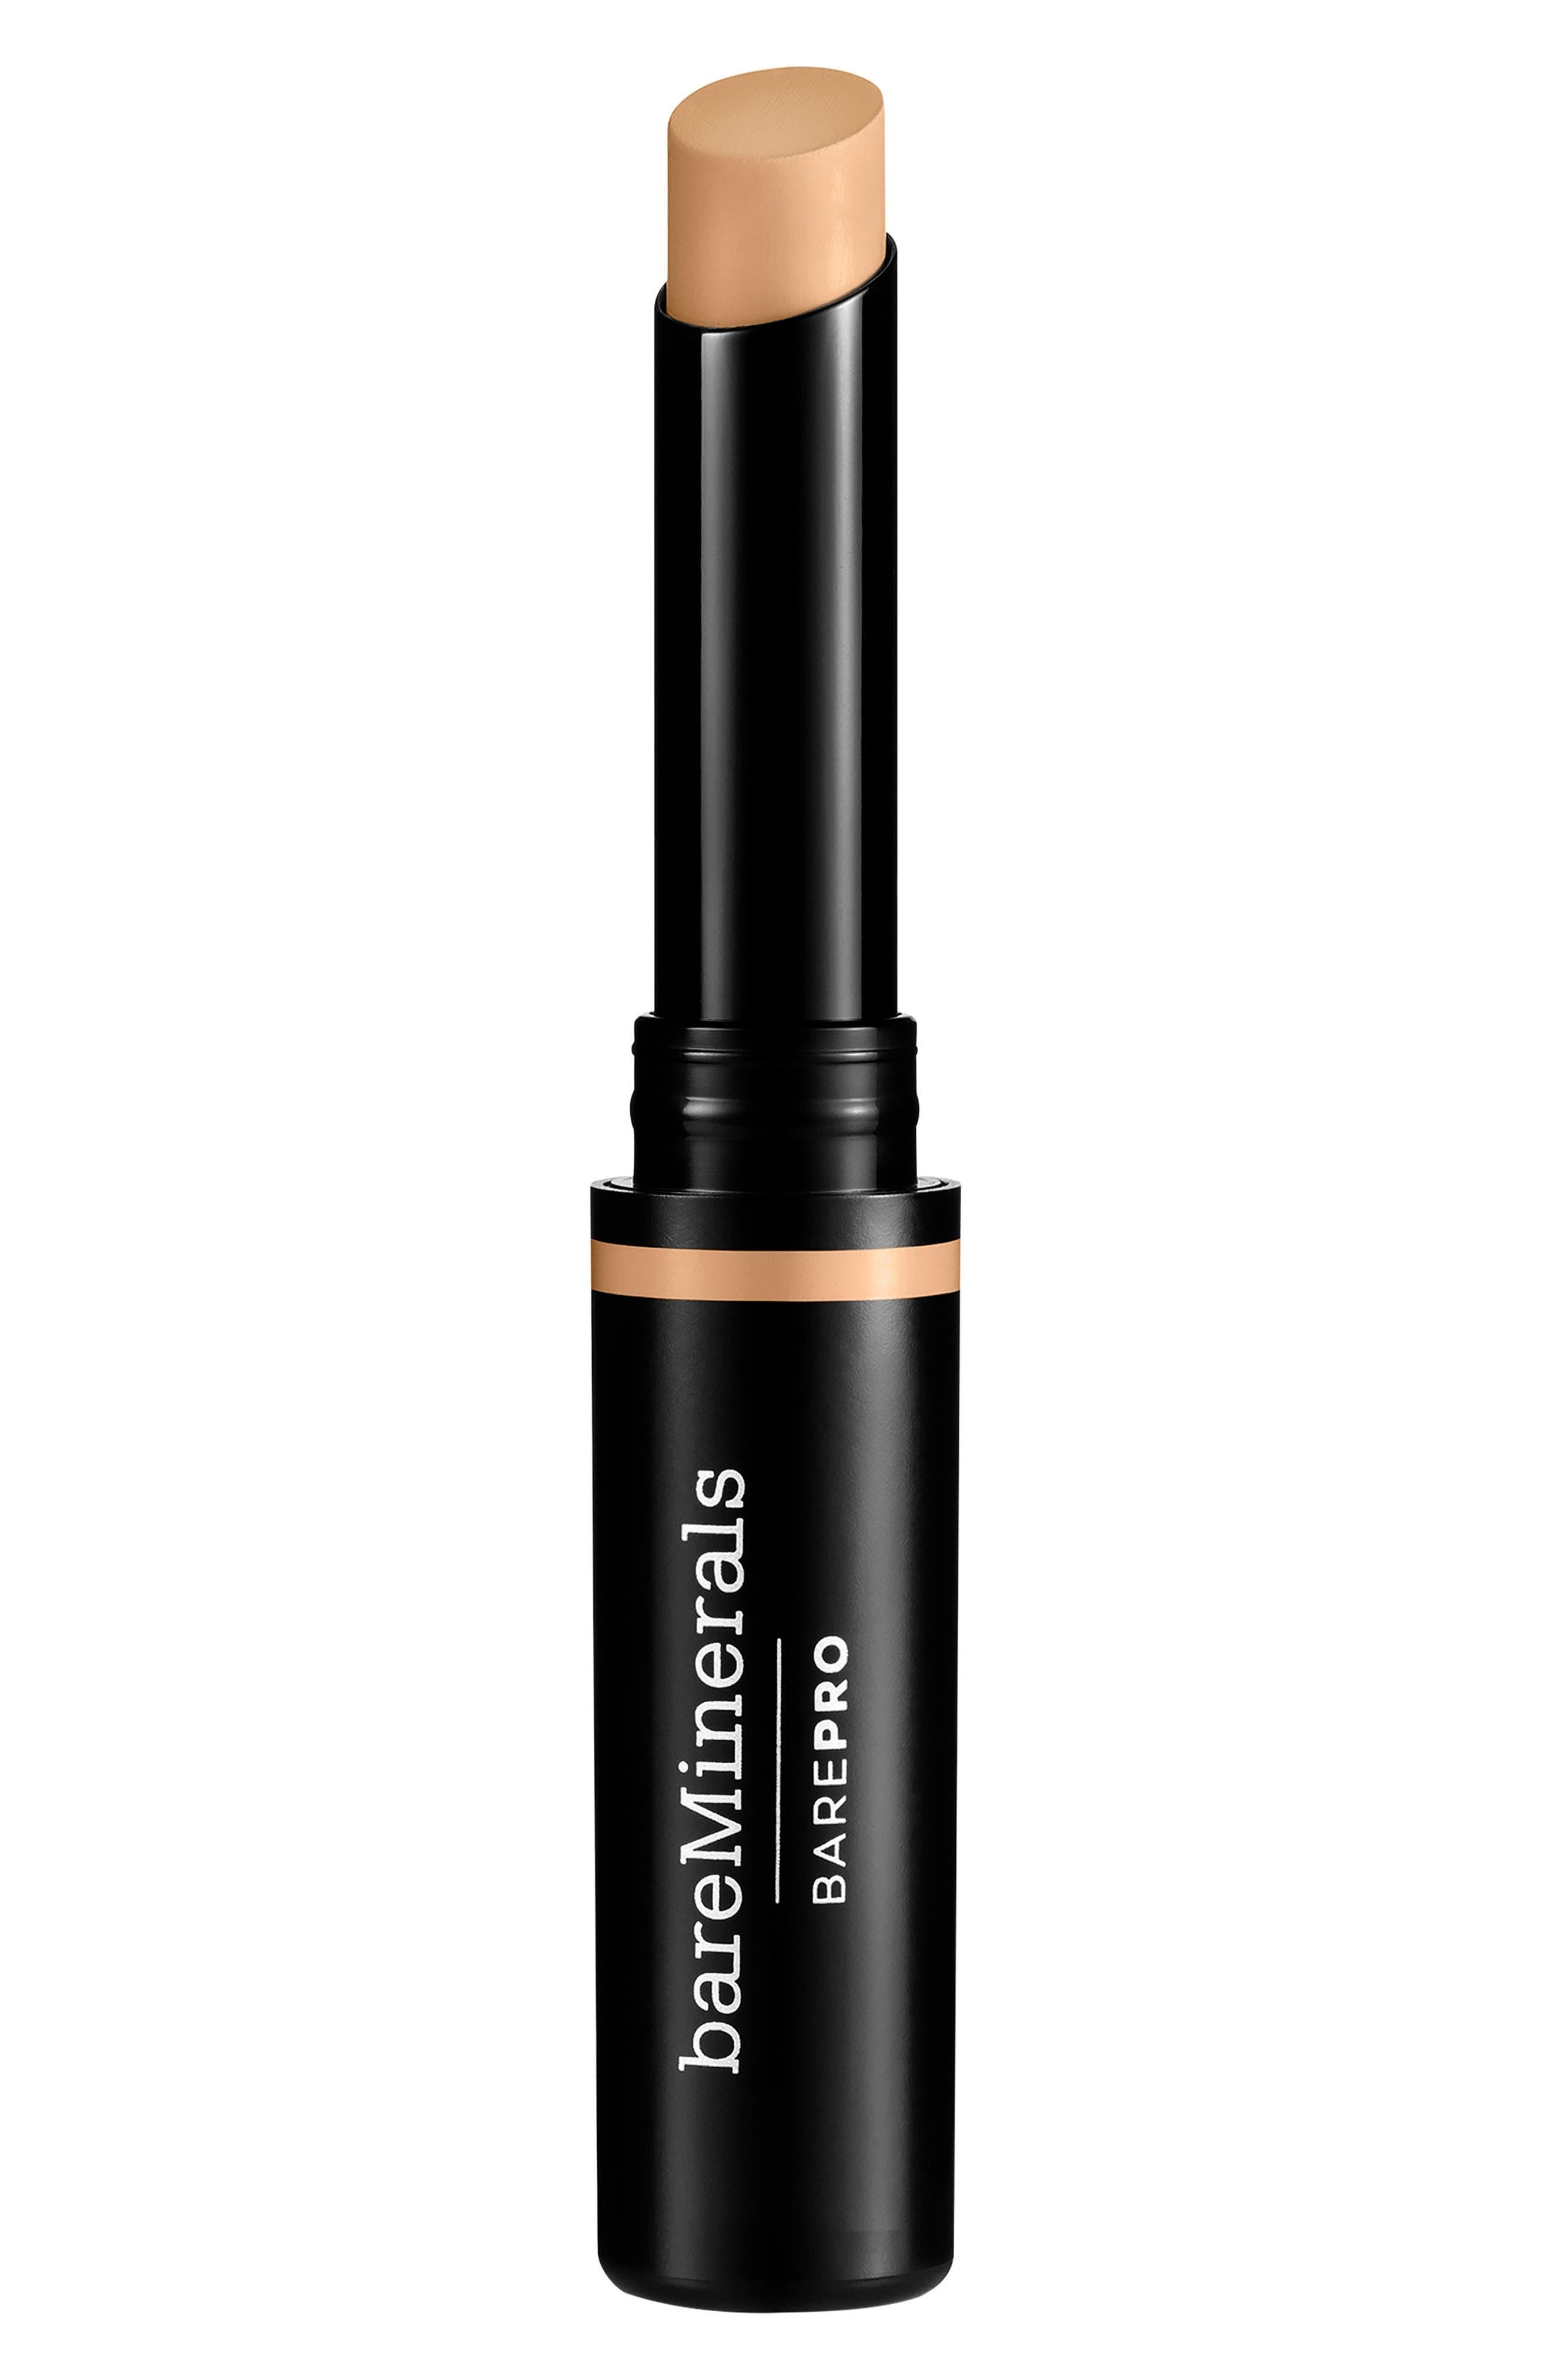 BarePro<sup>®</sup> Stick Concealer,                             Main thumbnail 1, color,                             09 Tan-Warm